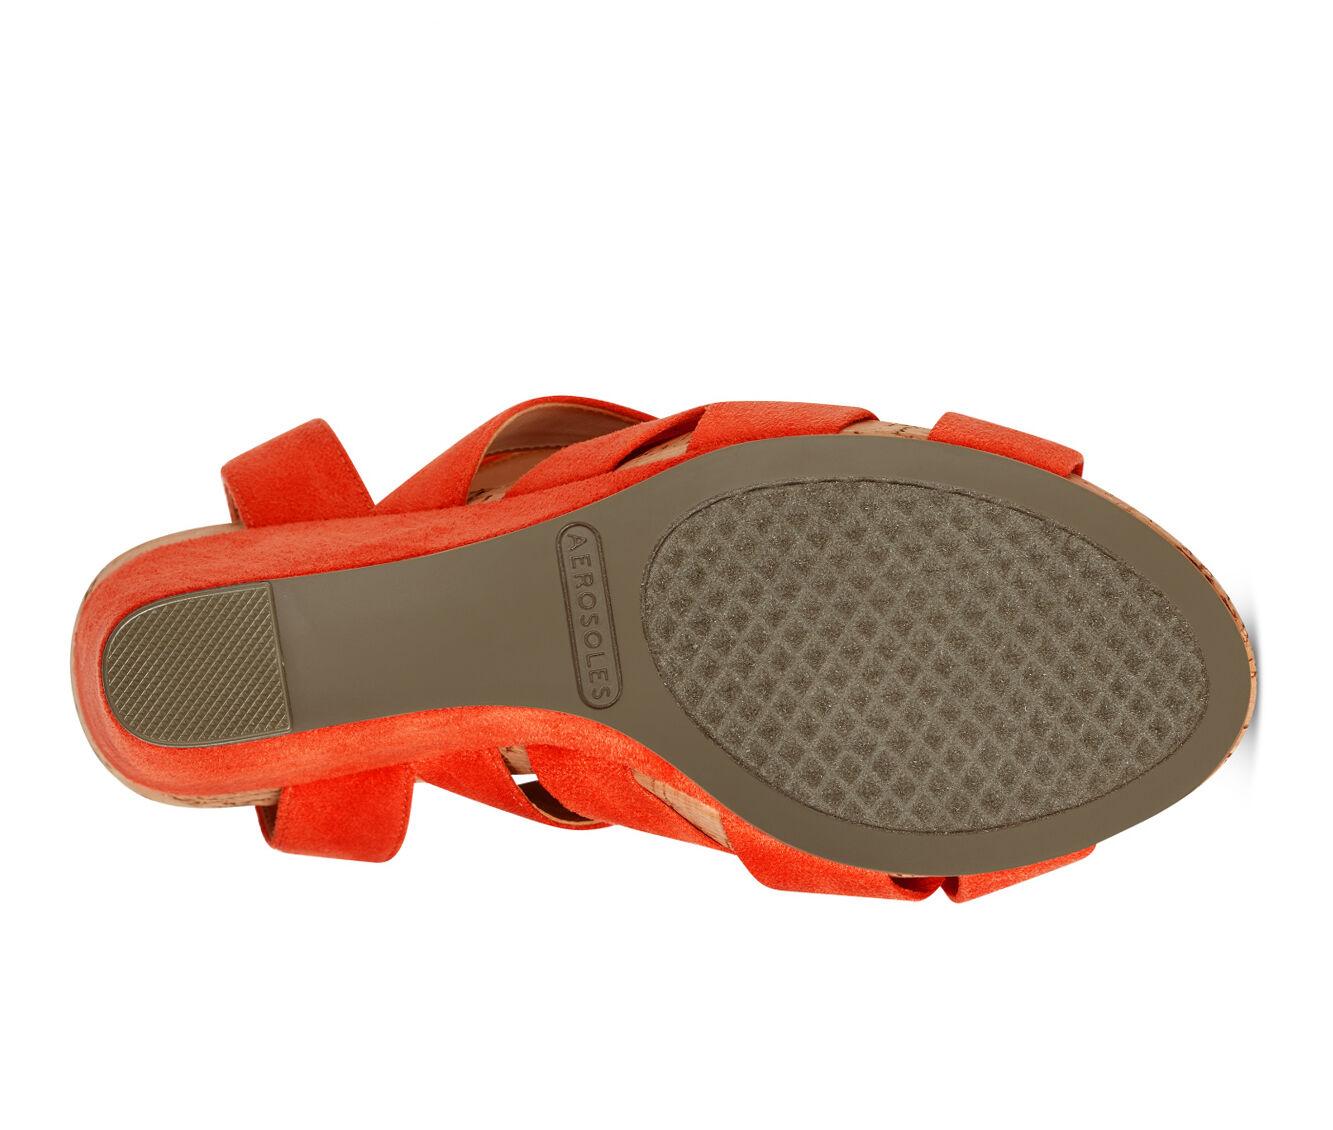 Women's Aerosoles Phoenix Wedges | Women's shoes | 2020 New Rvc1m